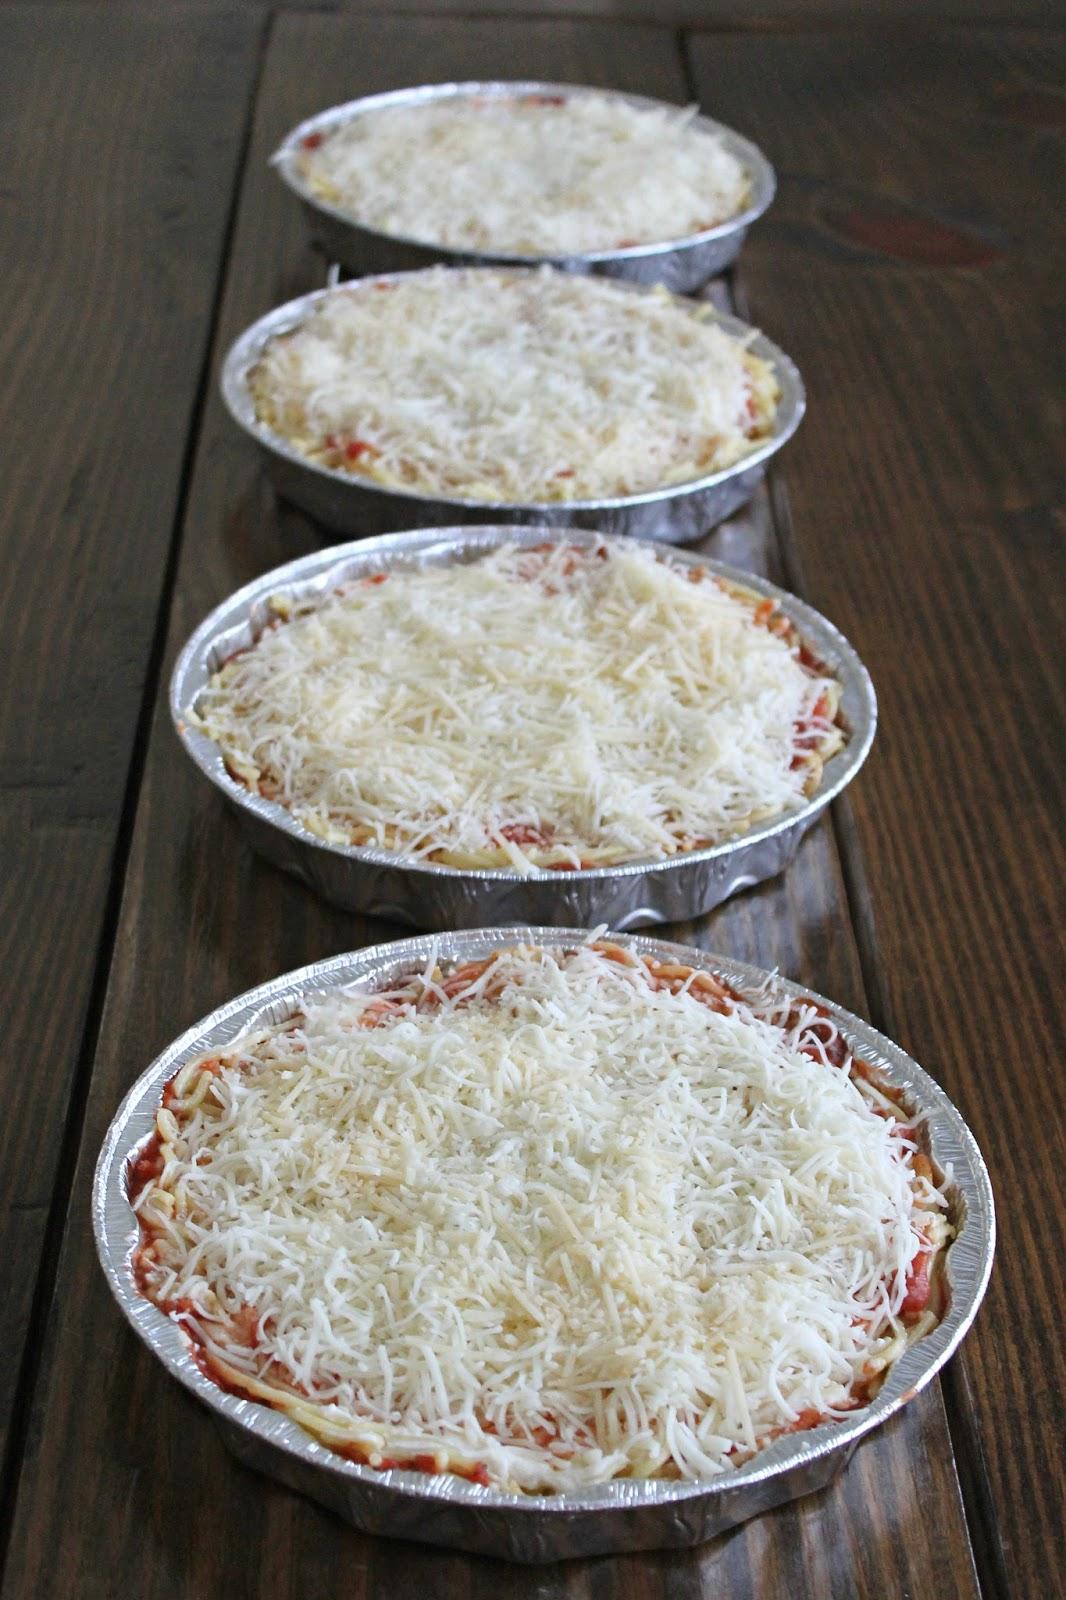 baked spaghetti freezer meals